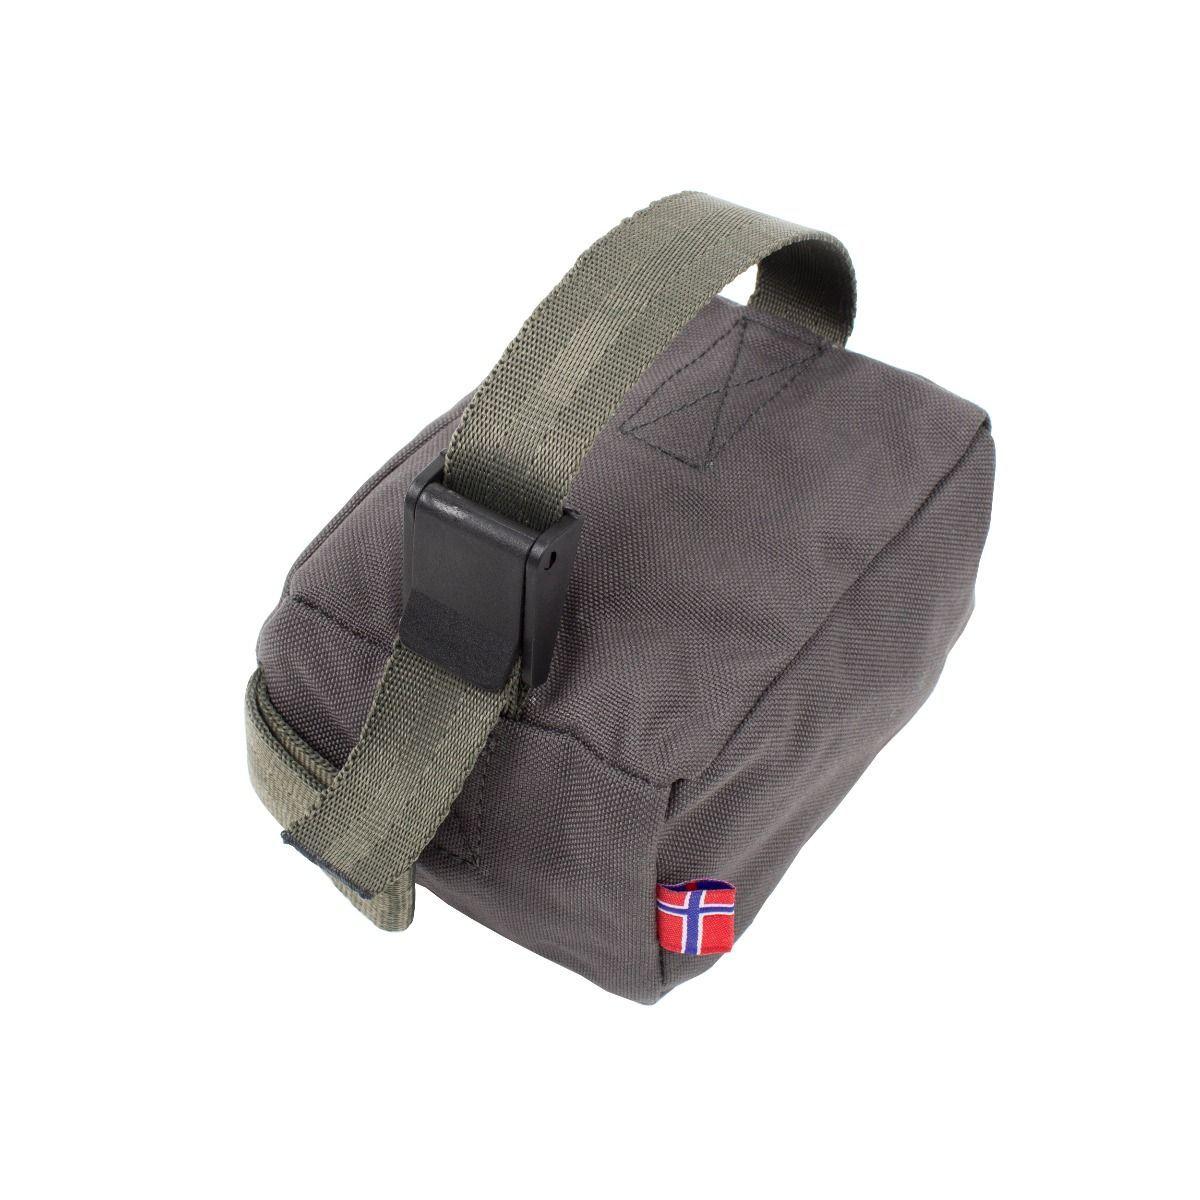 "Ulfhednar Rear Support PRS Shooting Bag Rest ""Brick"" #UH101 - Australian Tactical Precision"